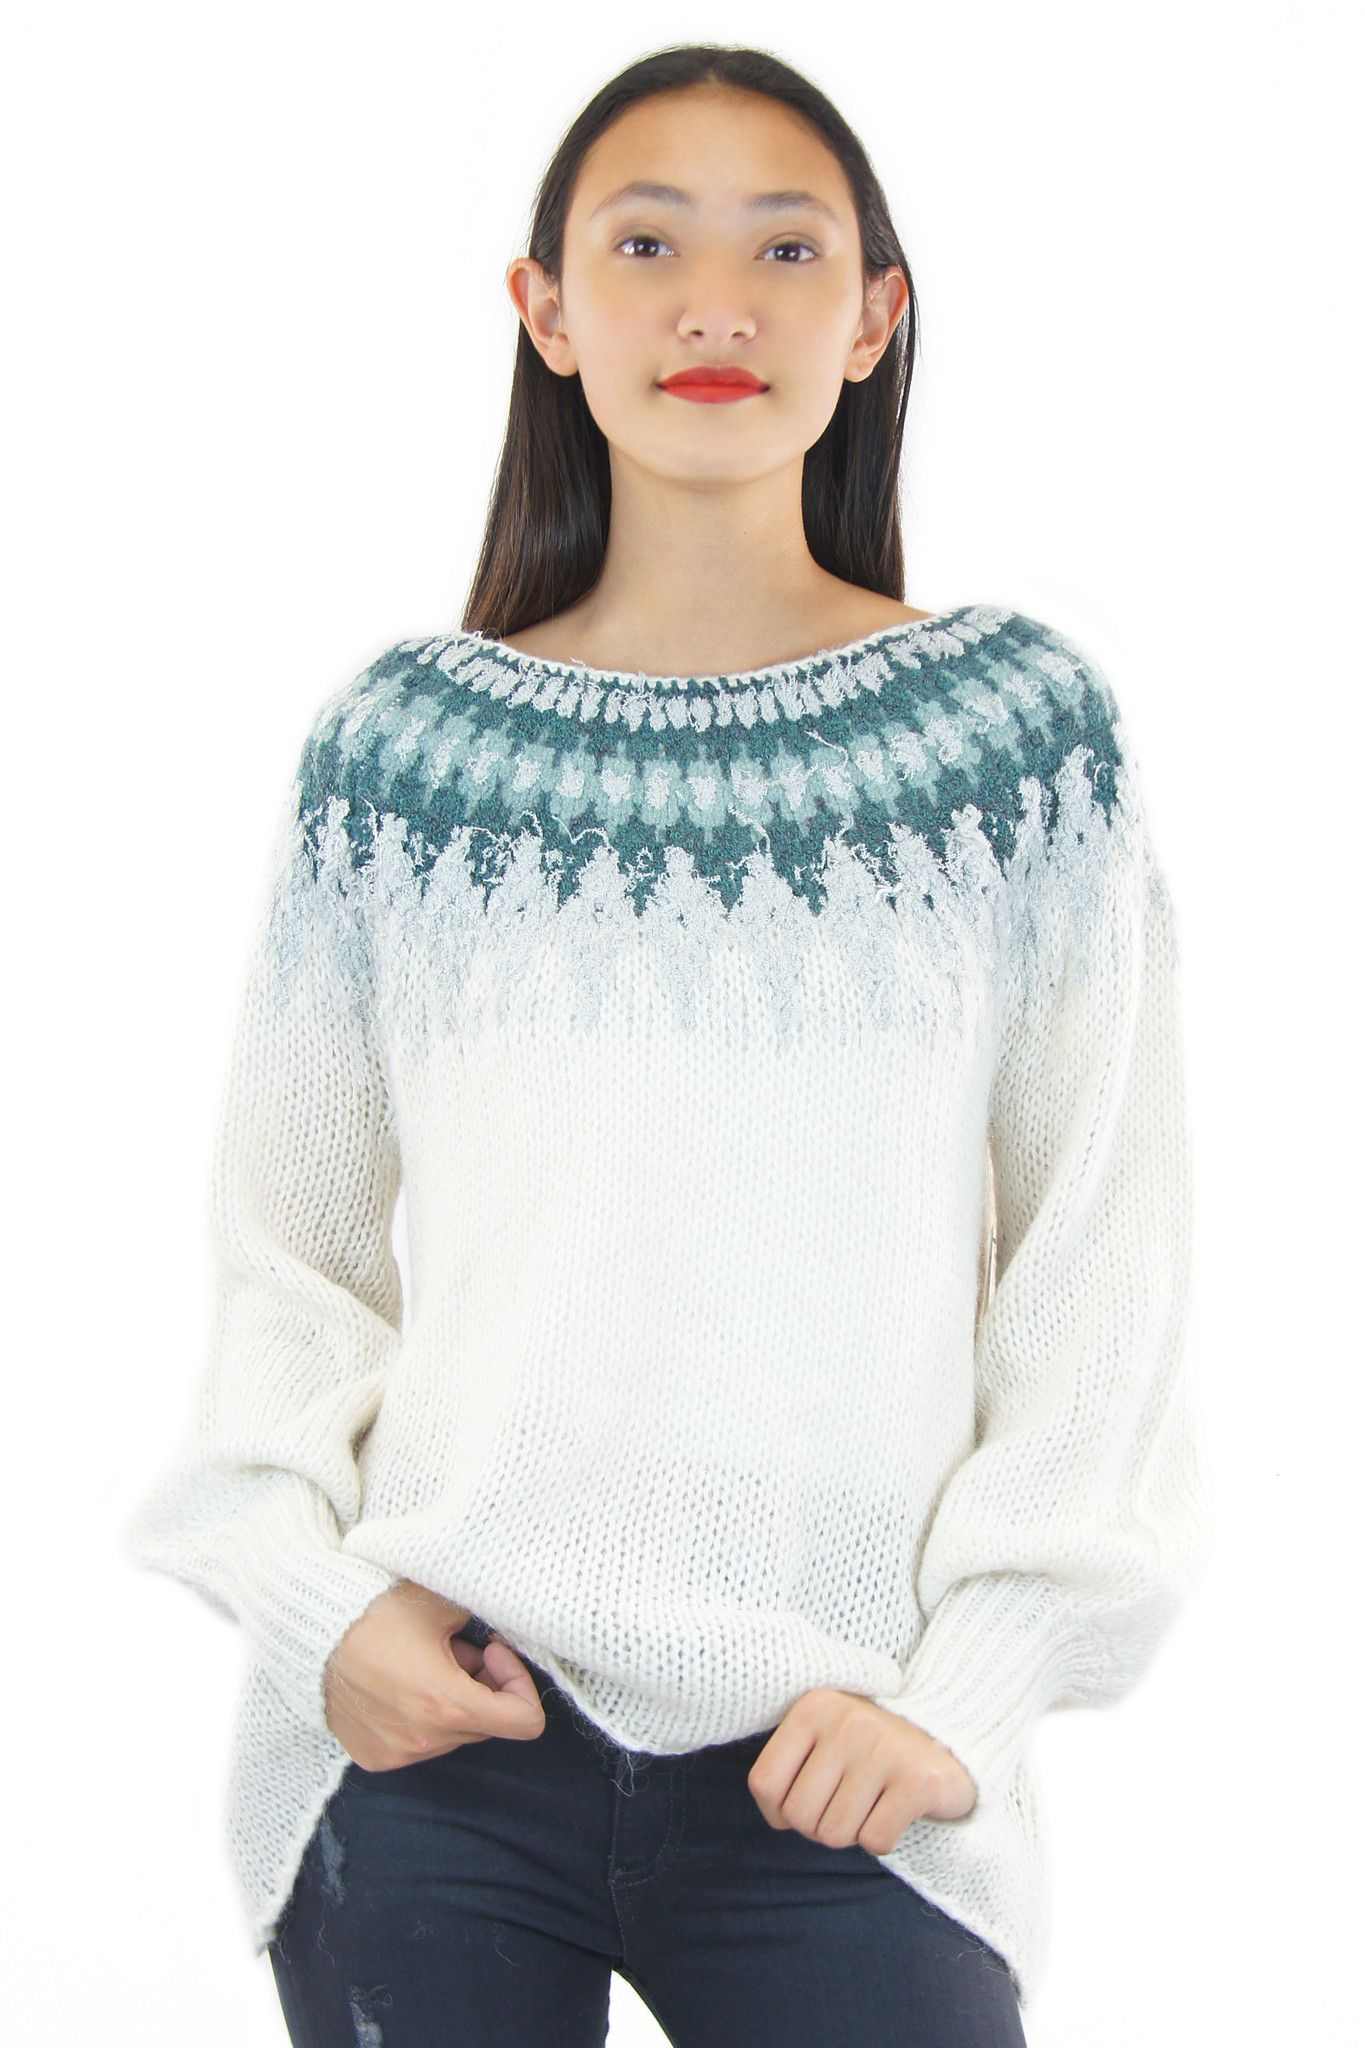 free people | baltic fairisle sweater | Fall 2015 | Pinterest ...